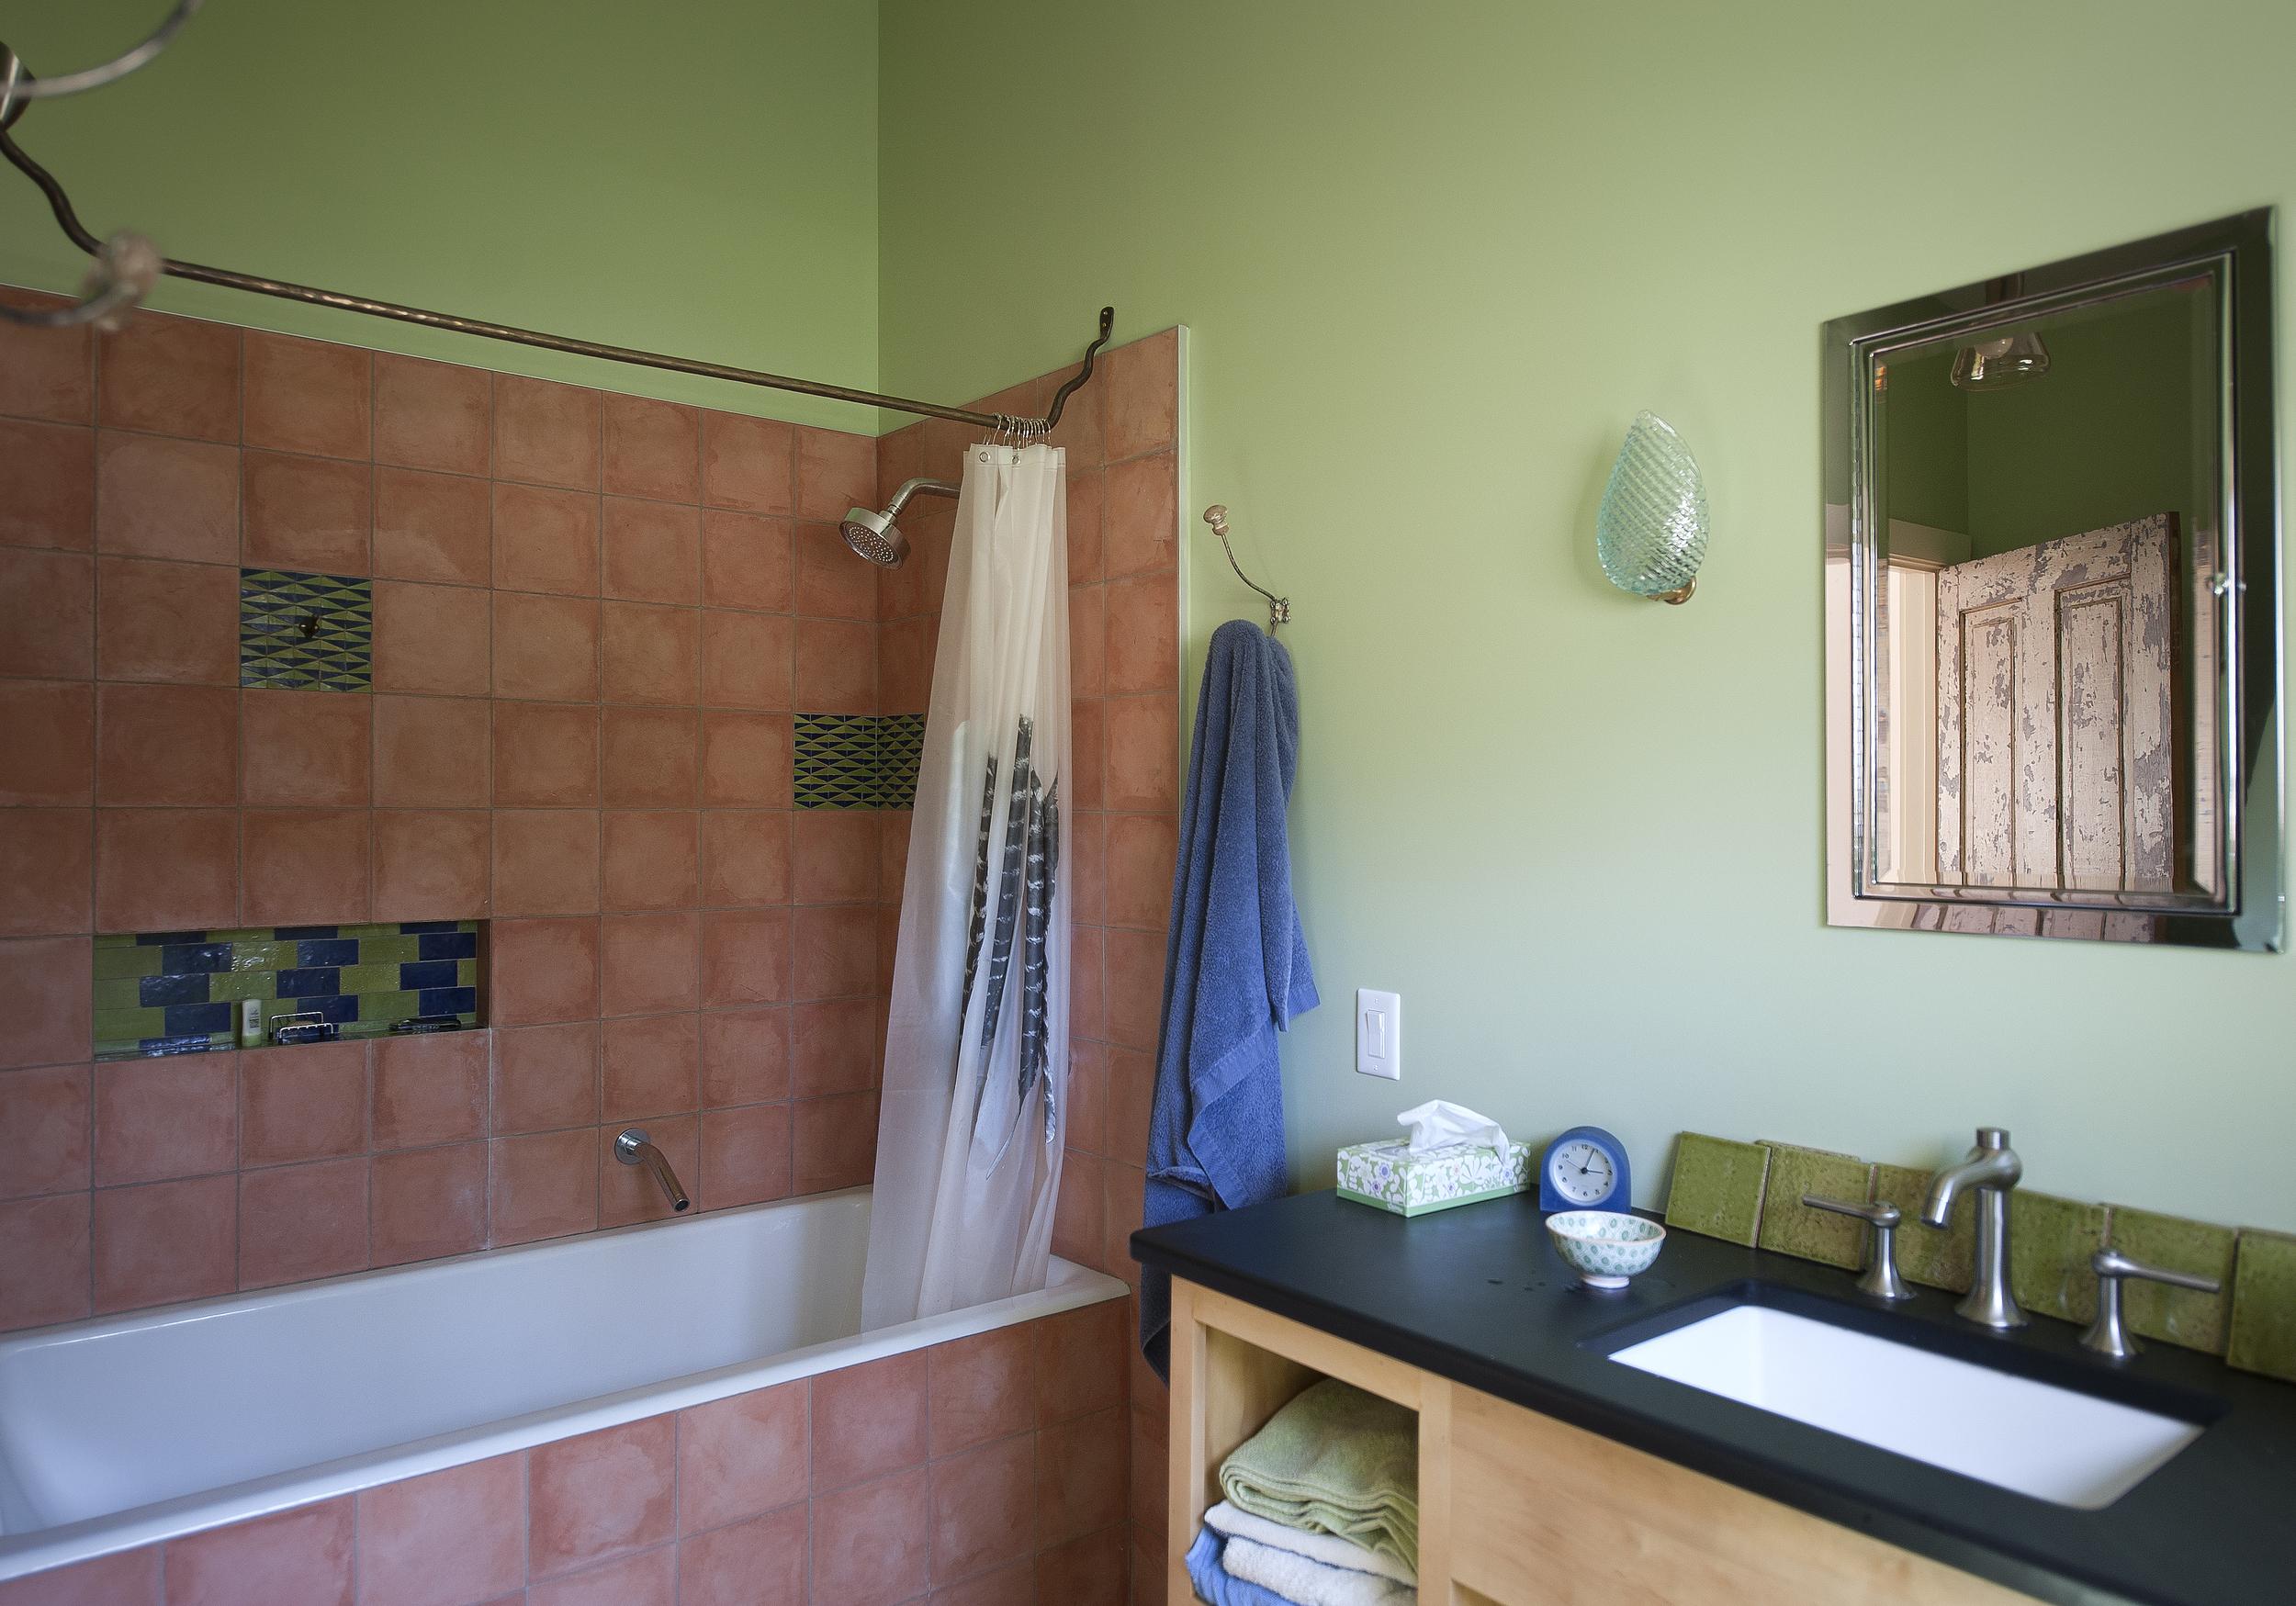 Bathroom-tub-rod.jpg